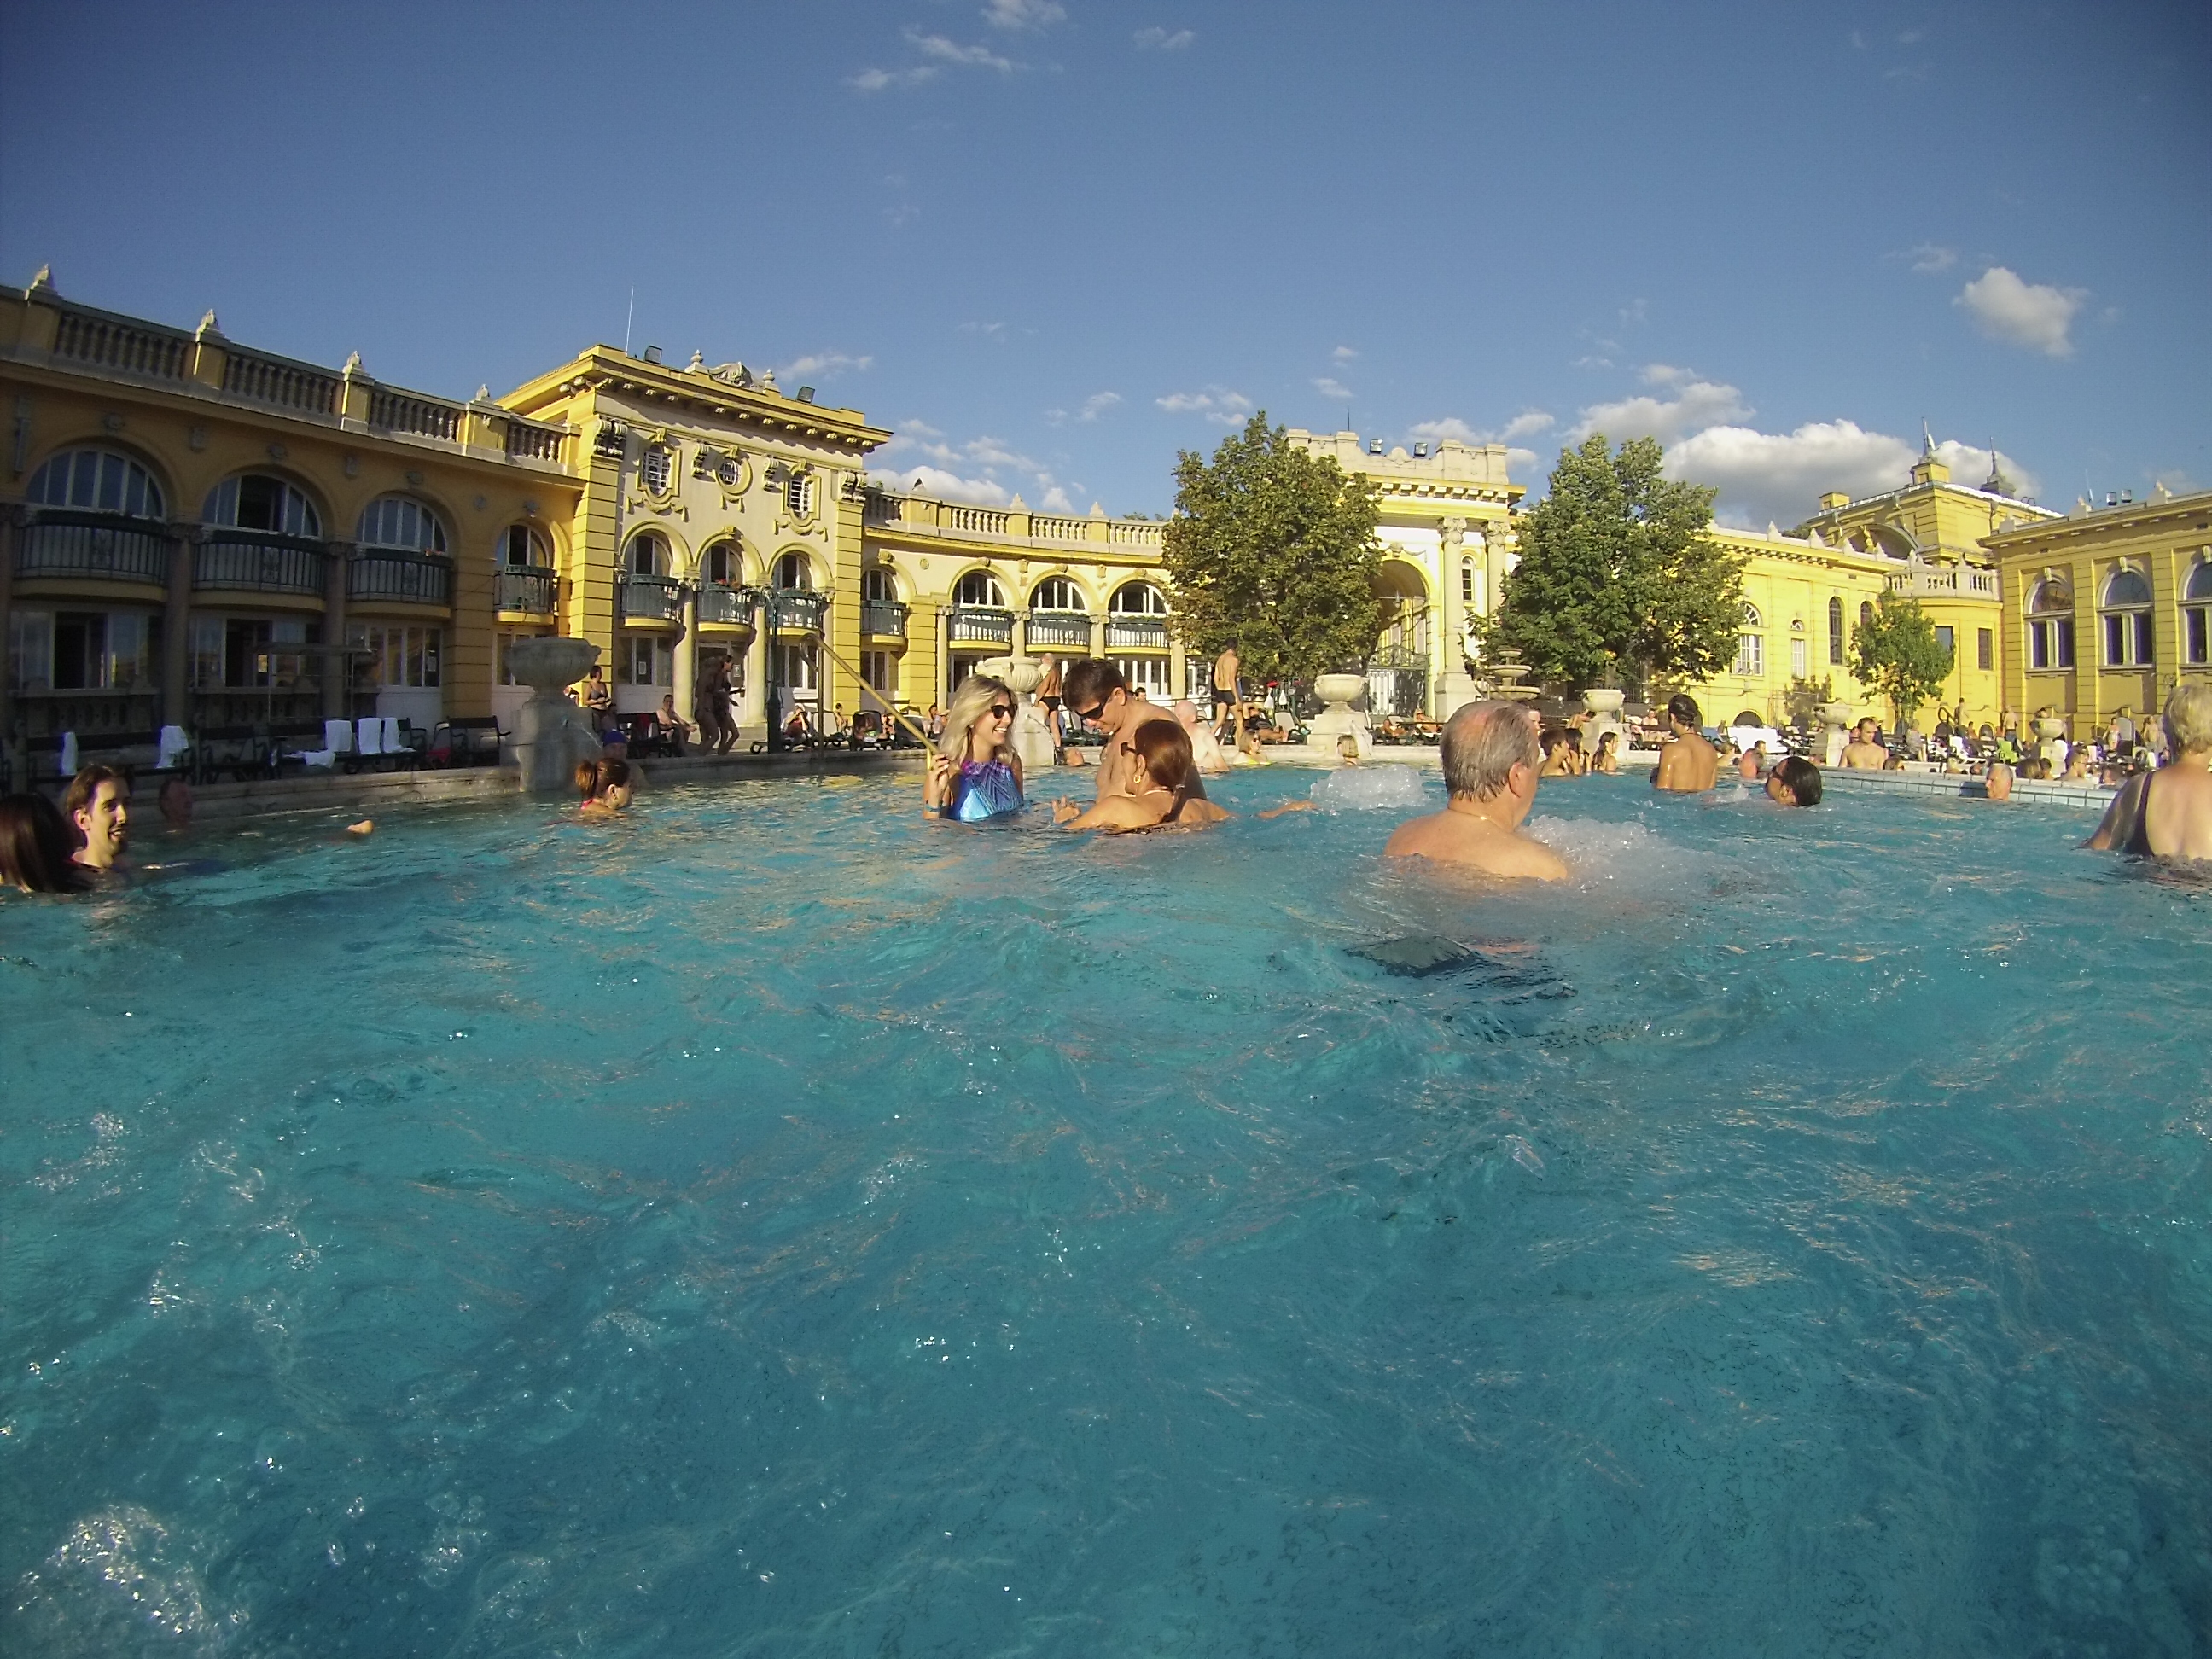 Széchenyi furdo thermal bath banho turco budapeste